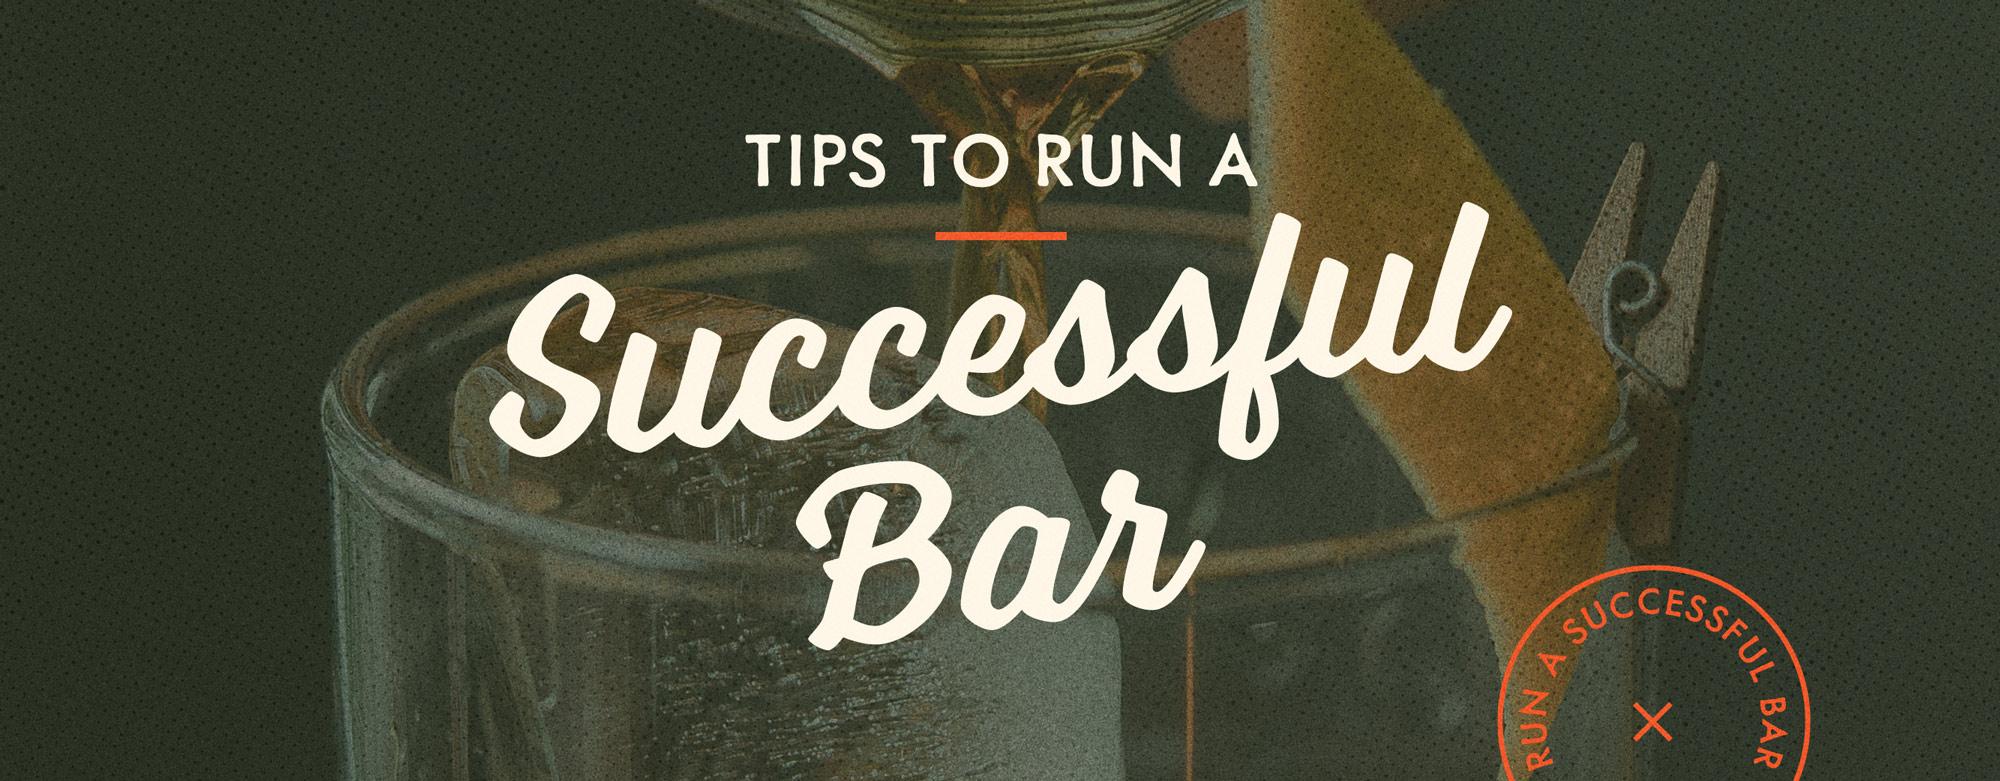 How to Run a Successful Bar